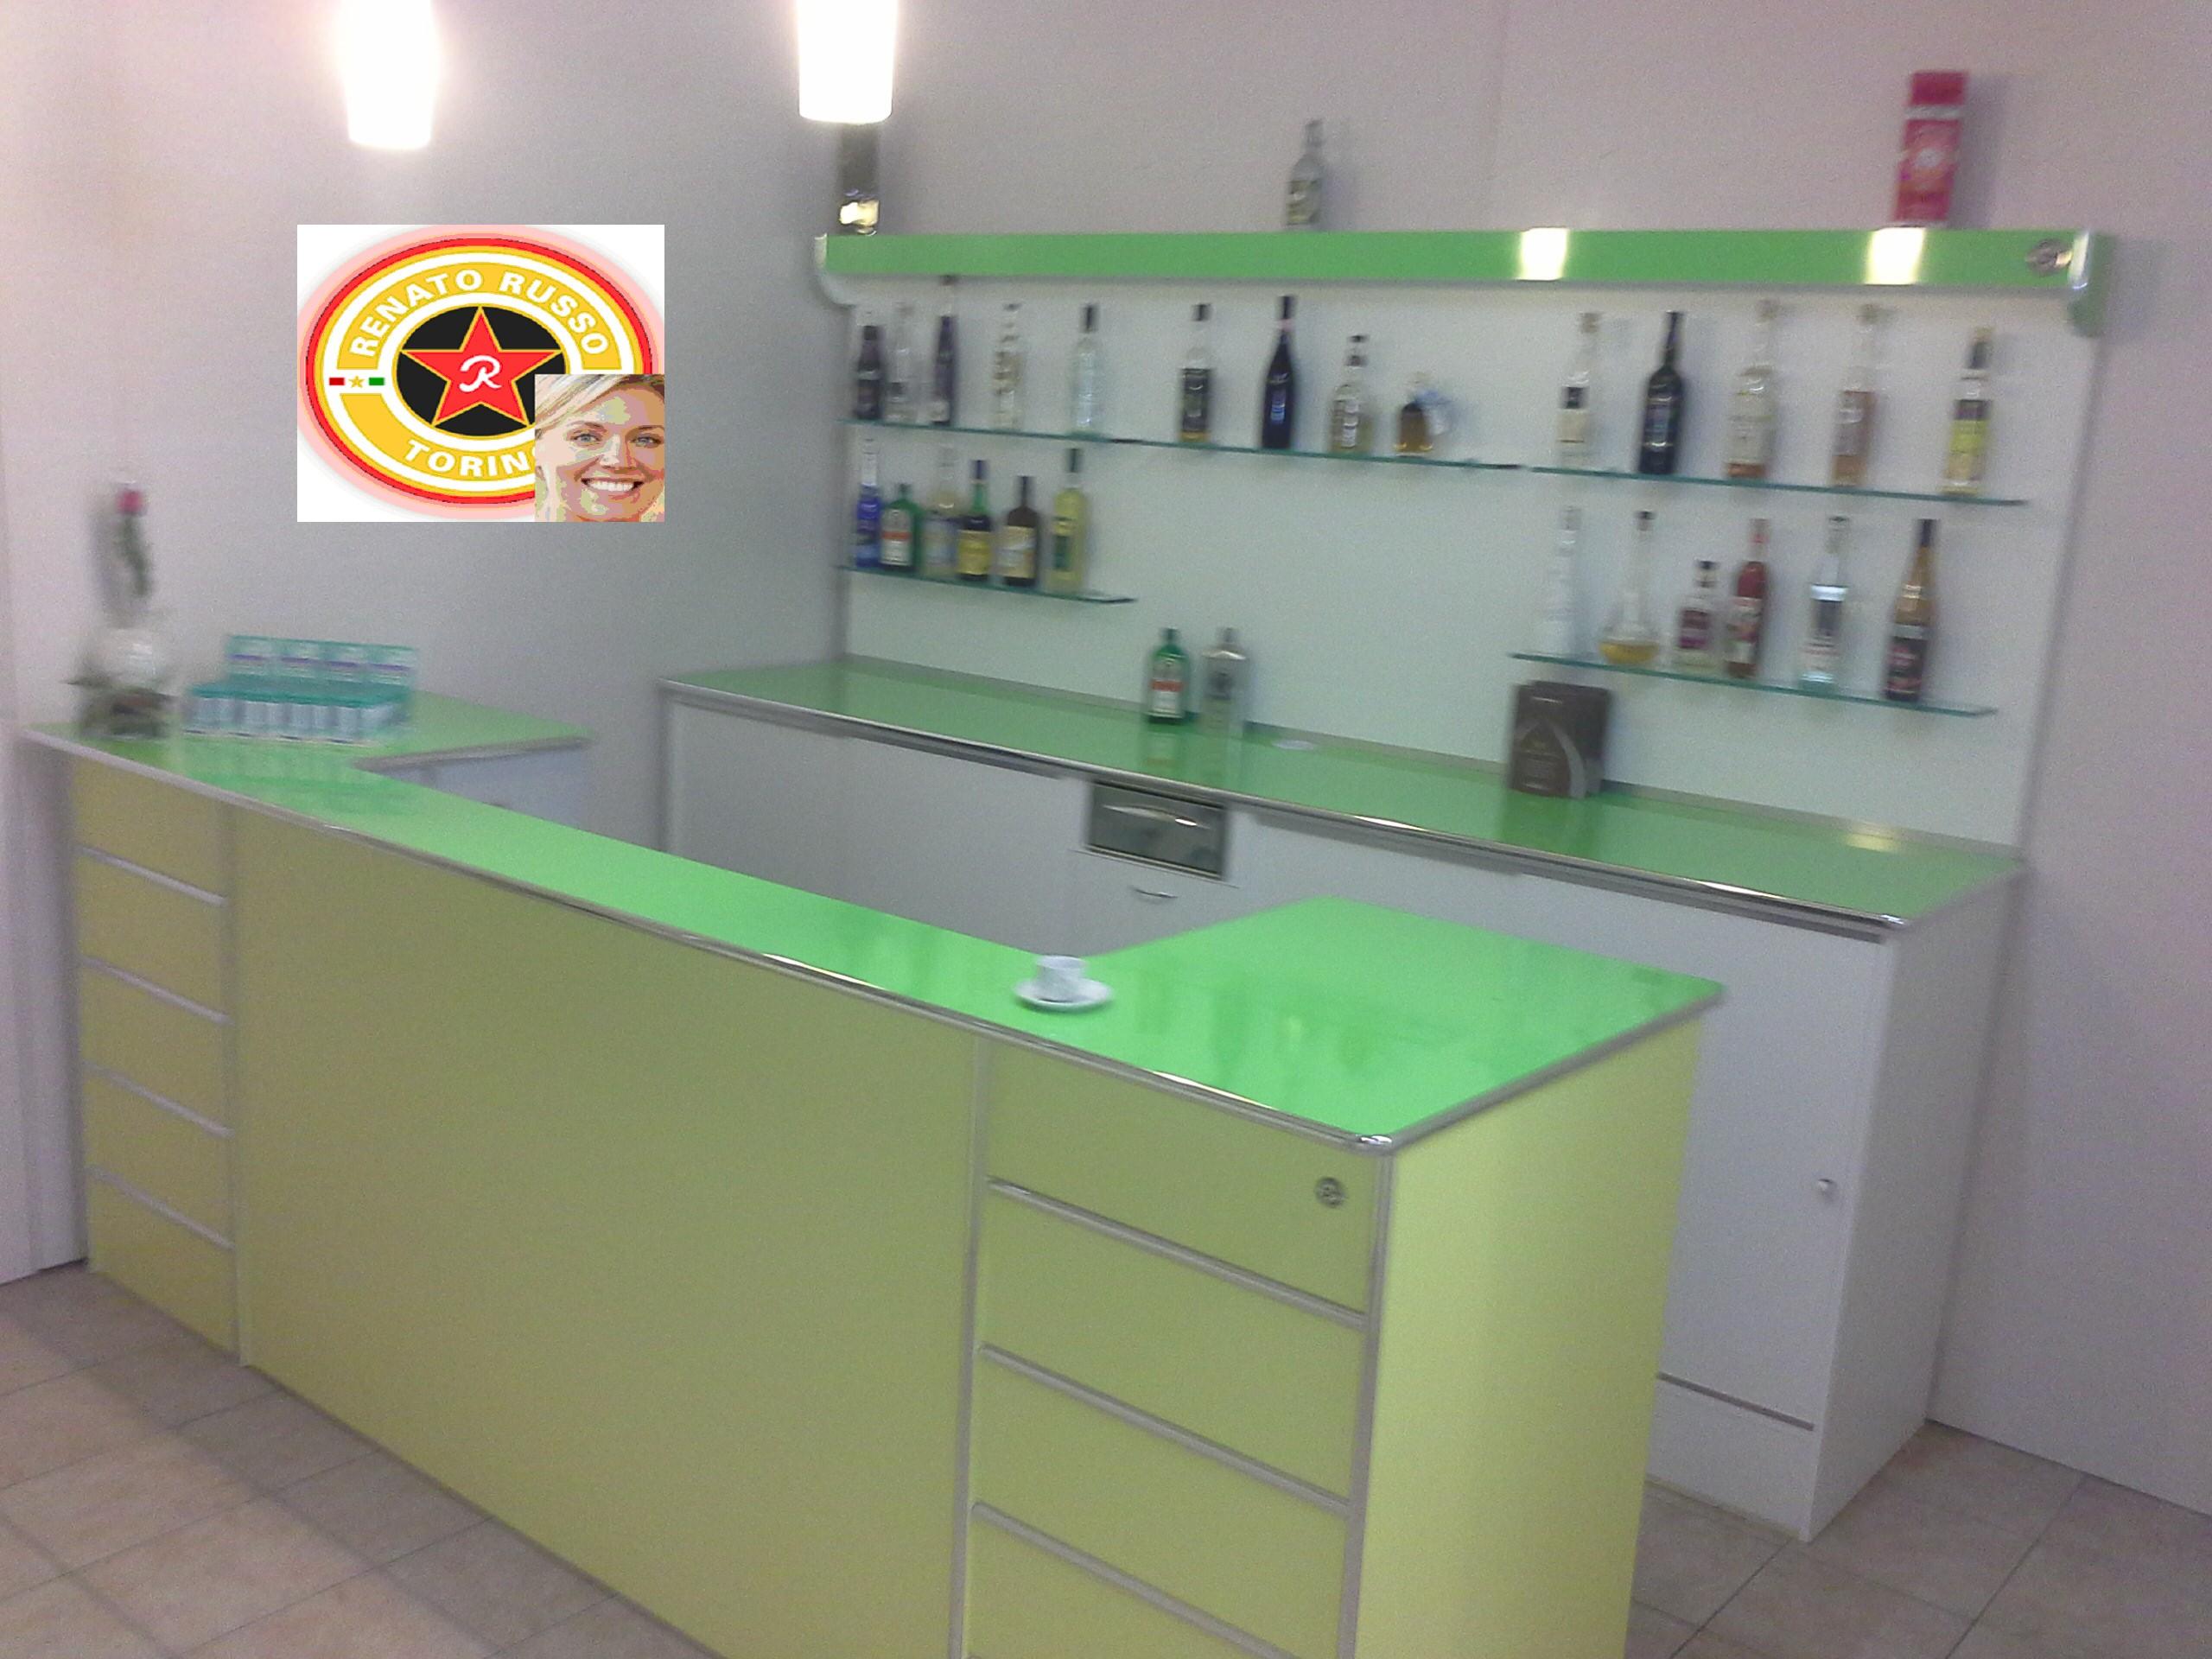 Bancone bar compra in fabbrica banconi bar produttori for Banconi bar milano